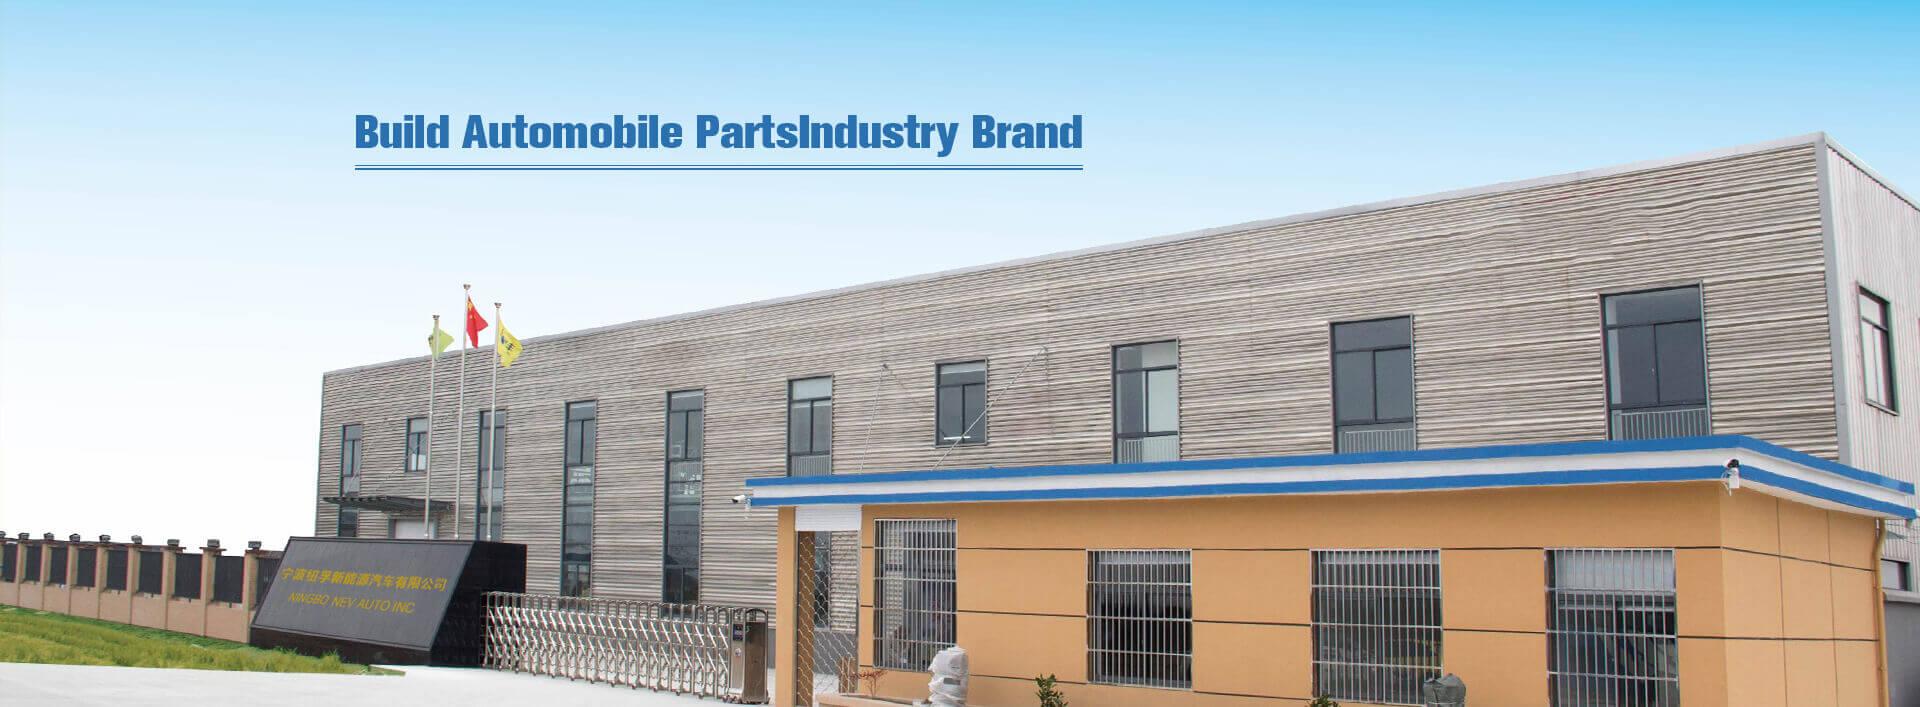 BUILD AUTOMOBILE PARTS INDUSTRY BRAND